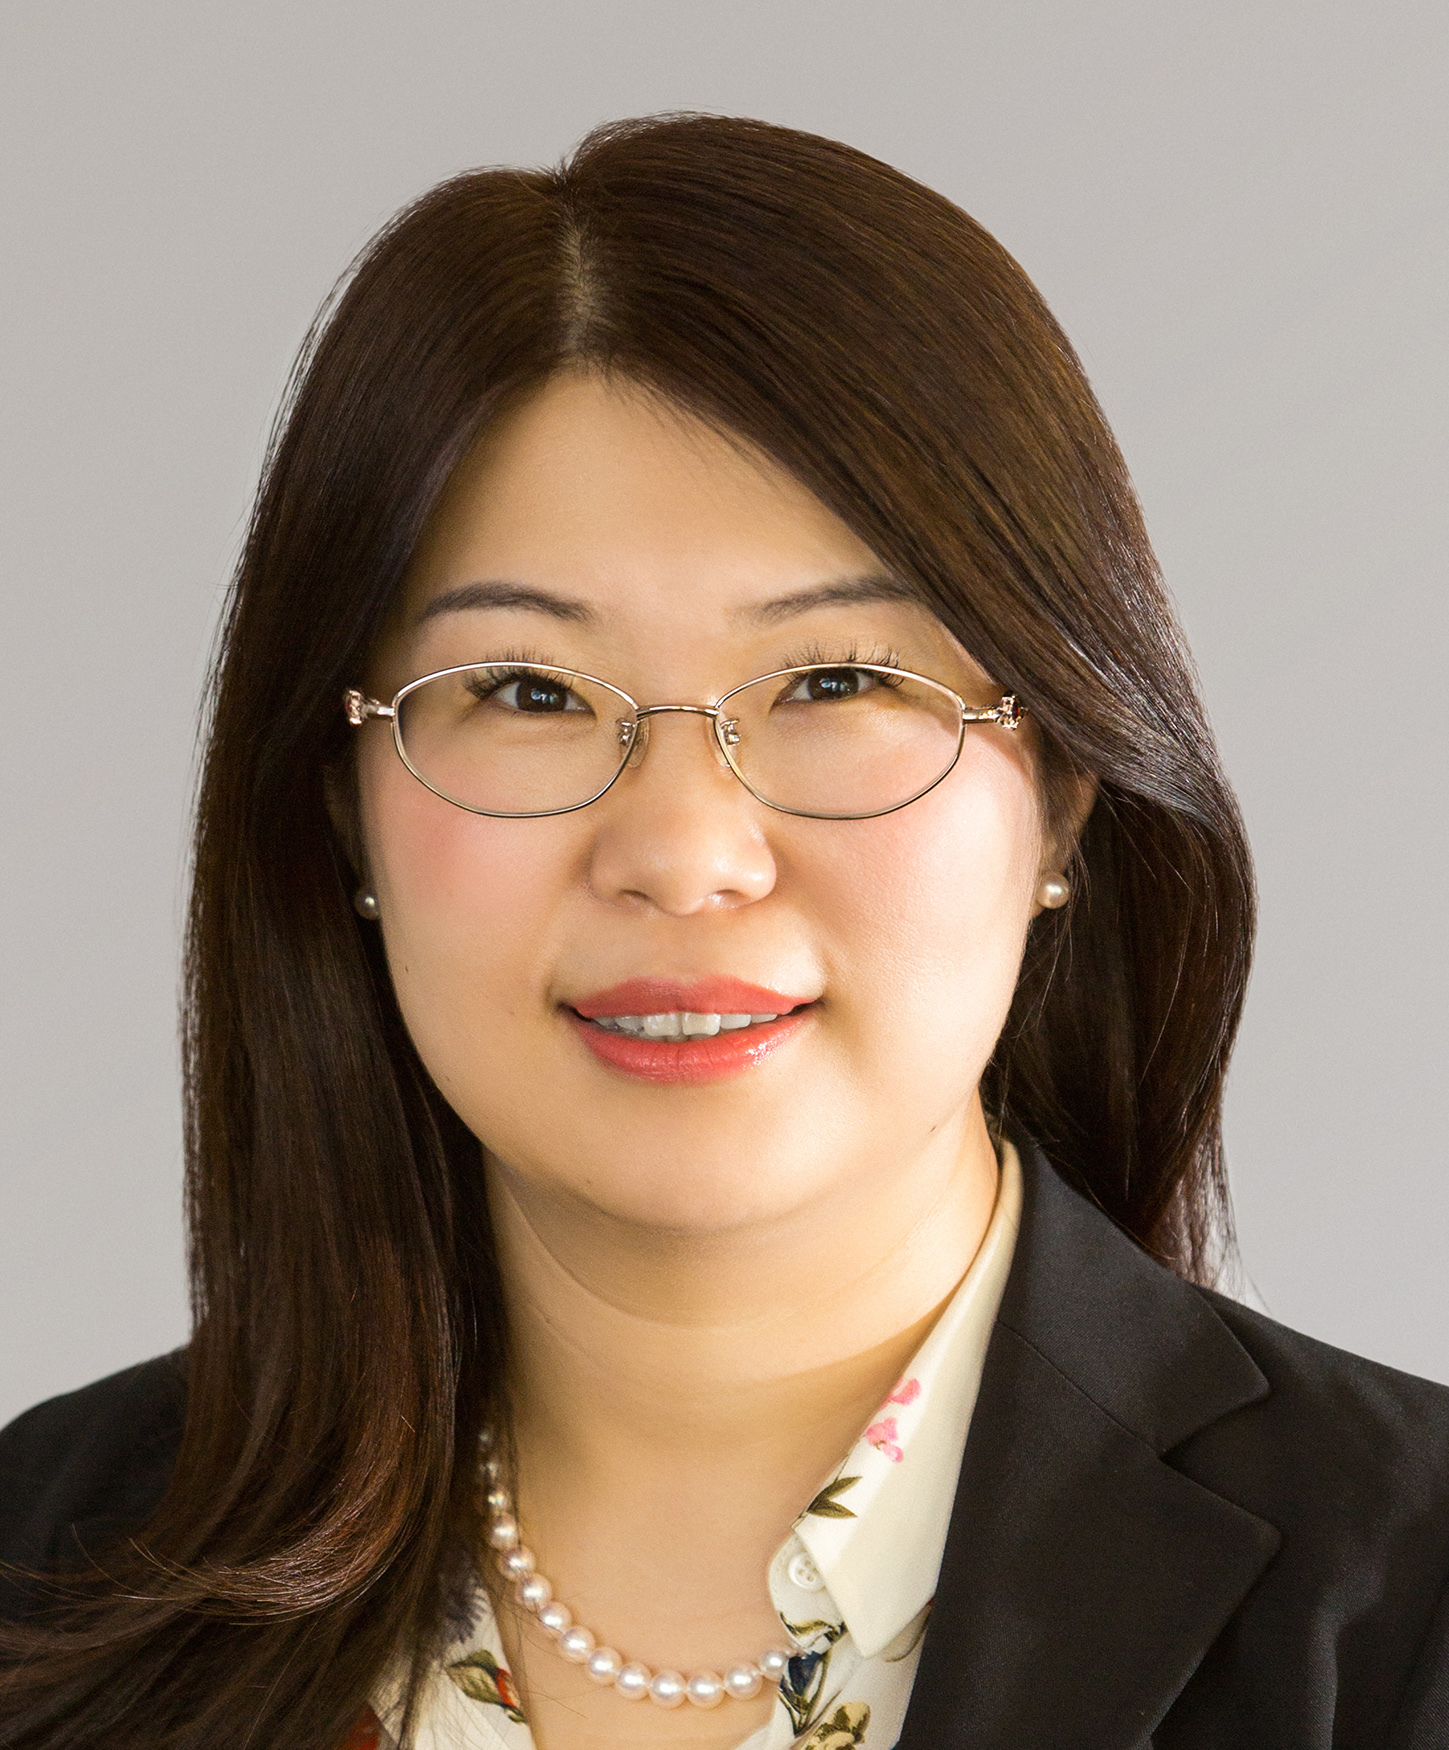 Image of Wendy Wang